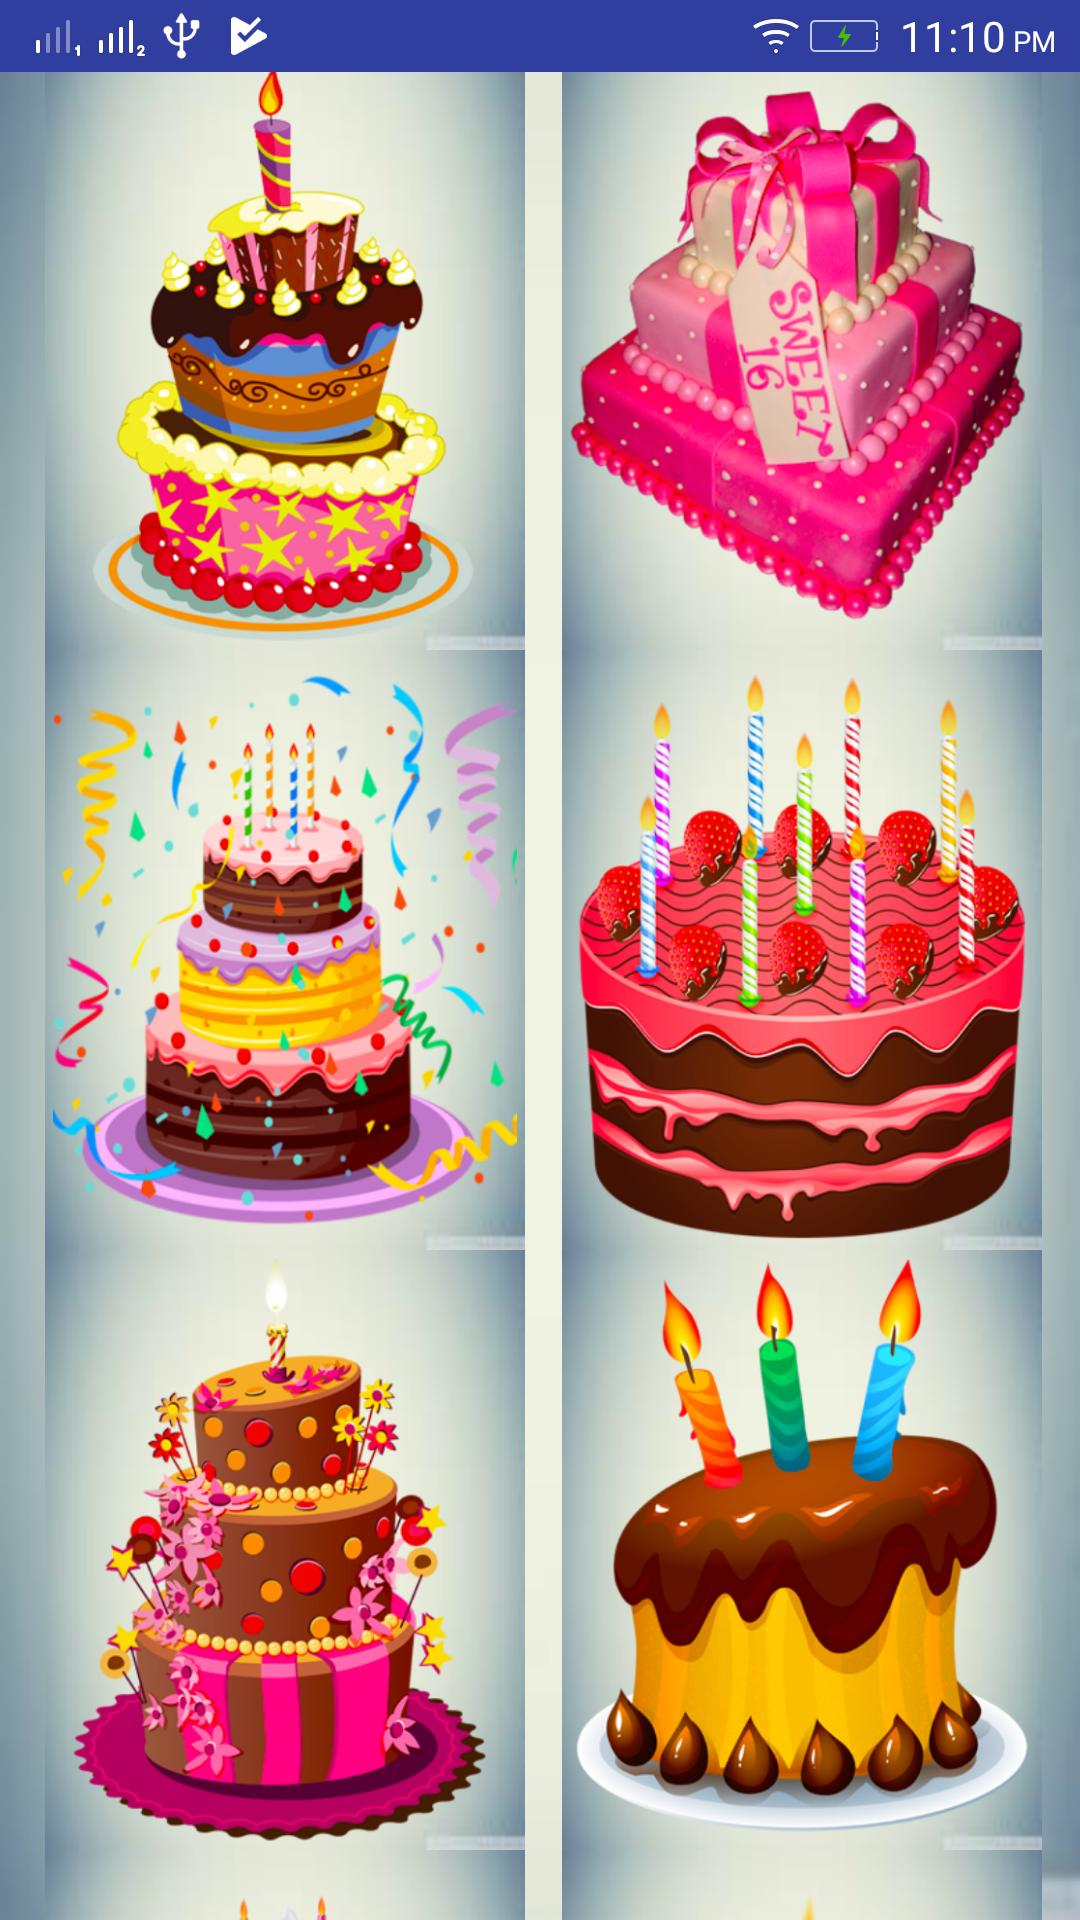 Birthday Song Maker